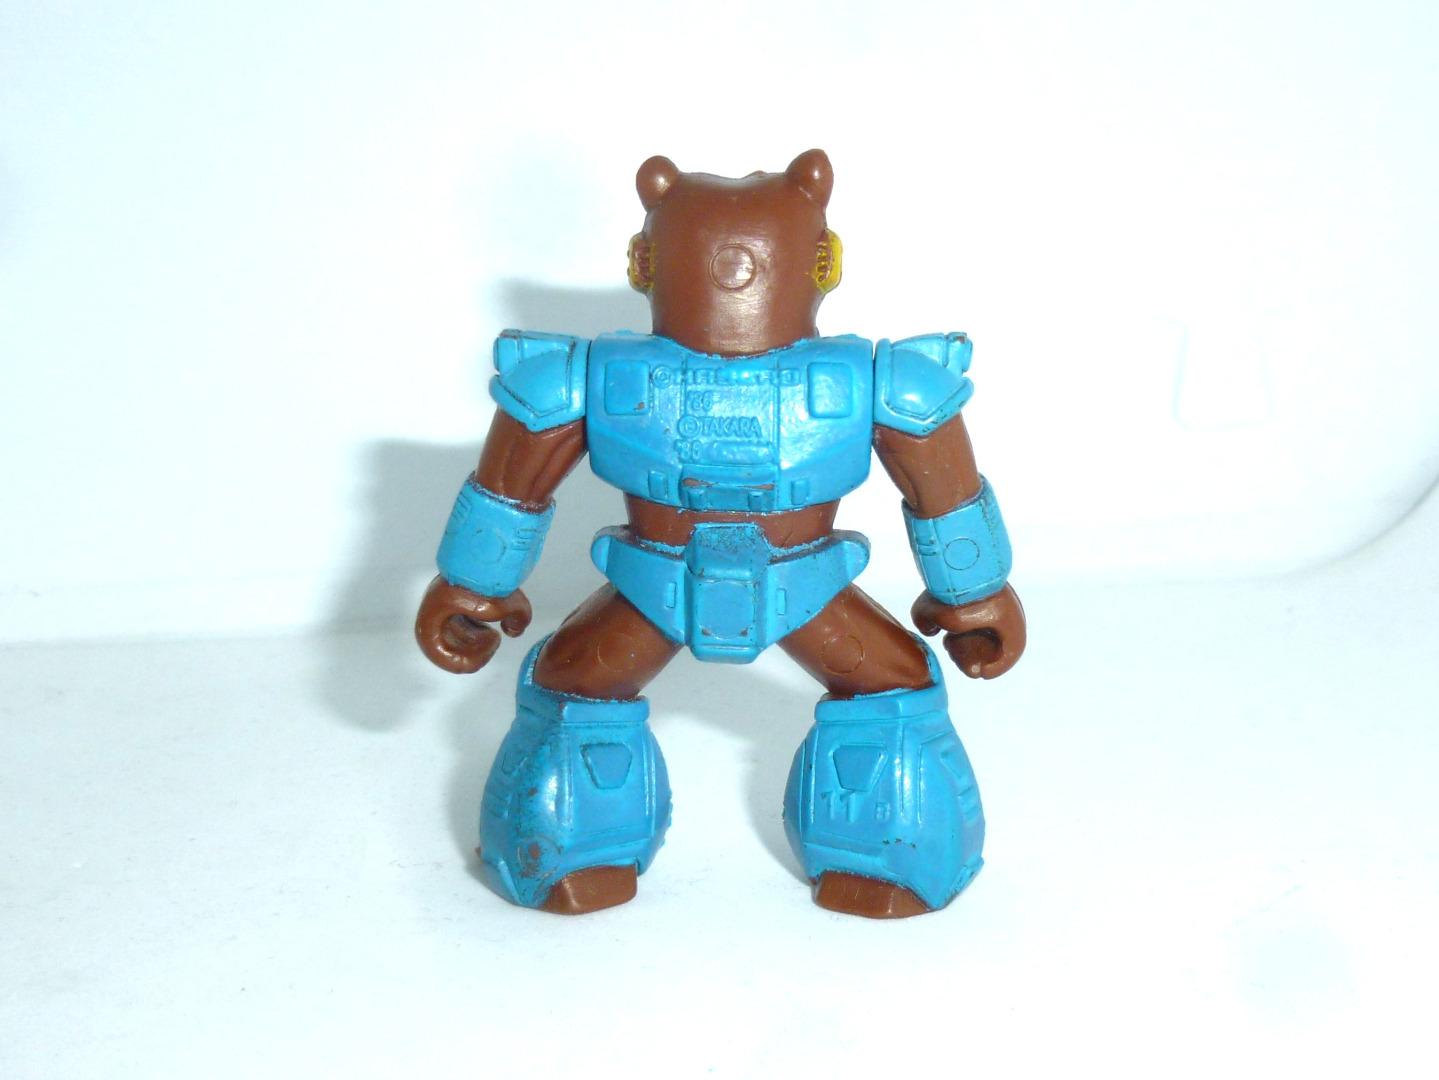 Battle Beasts Grizzly Bear Actionfigur Jetzt - 3